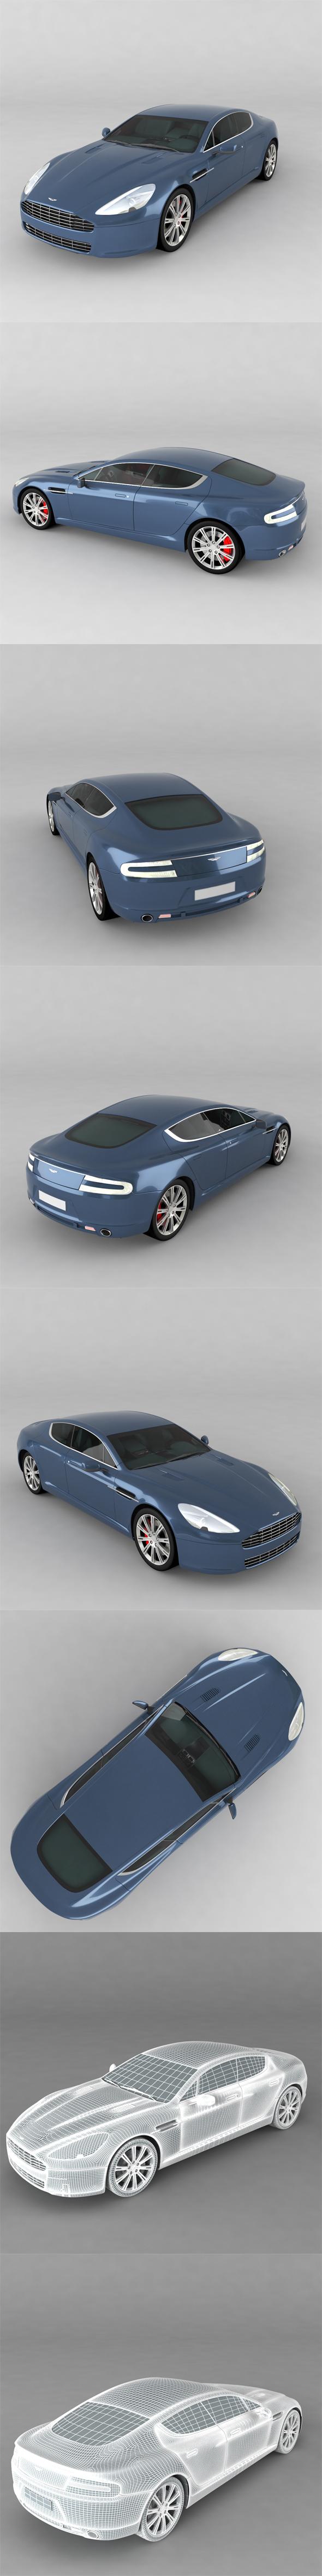 Aston Martin Rapide - 3DOcean Item for Sale